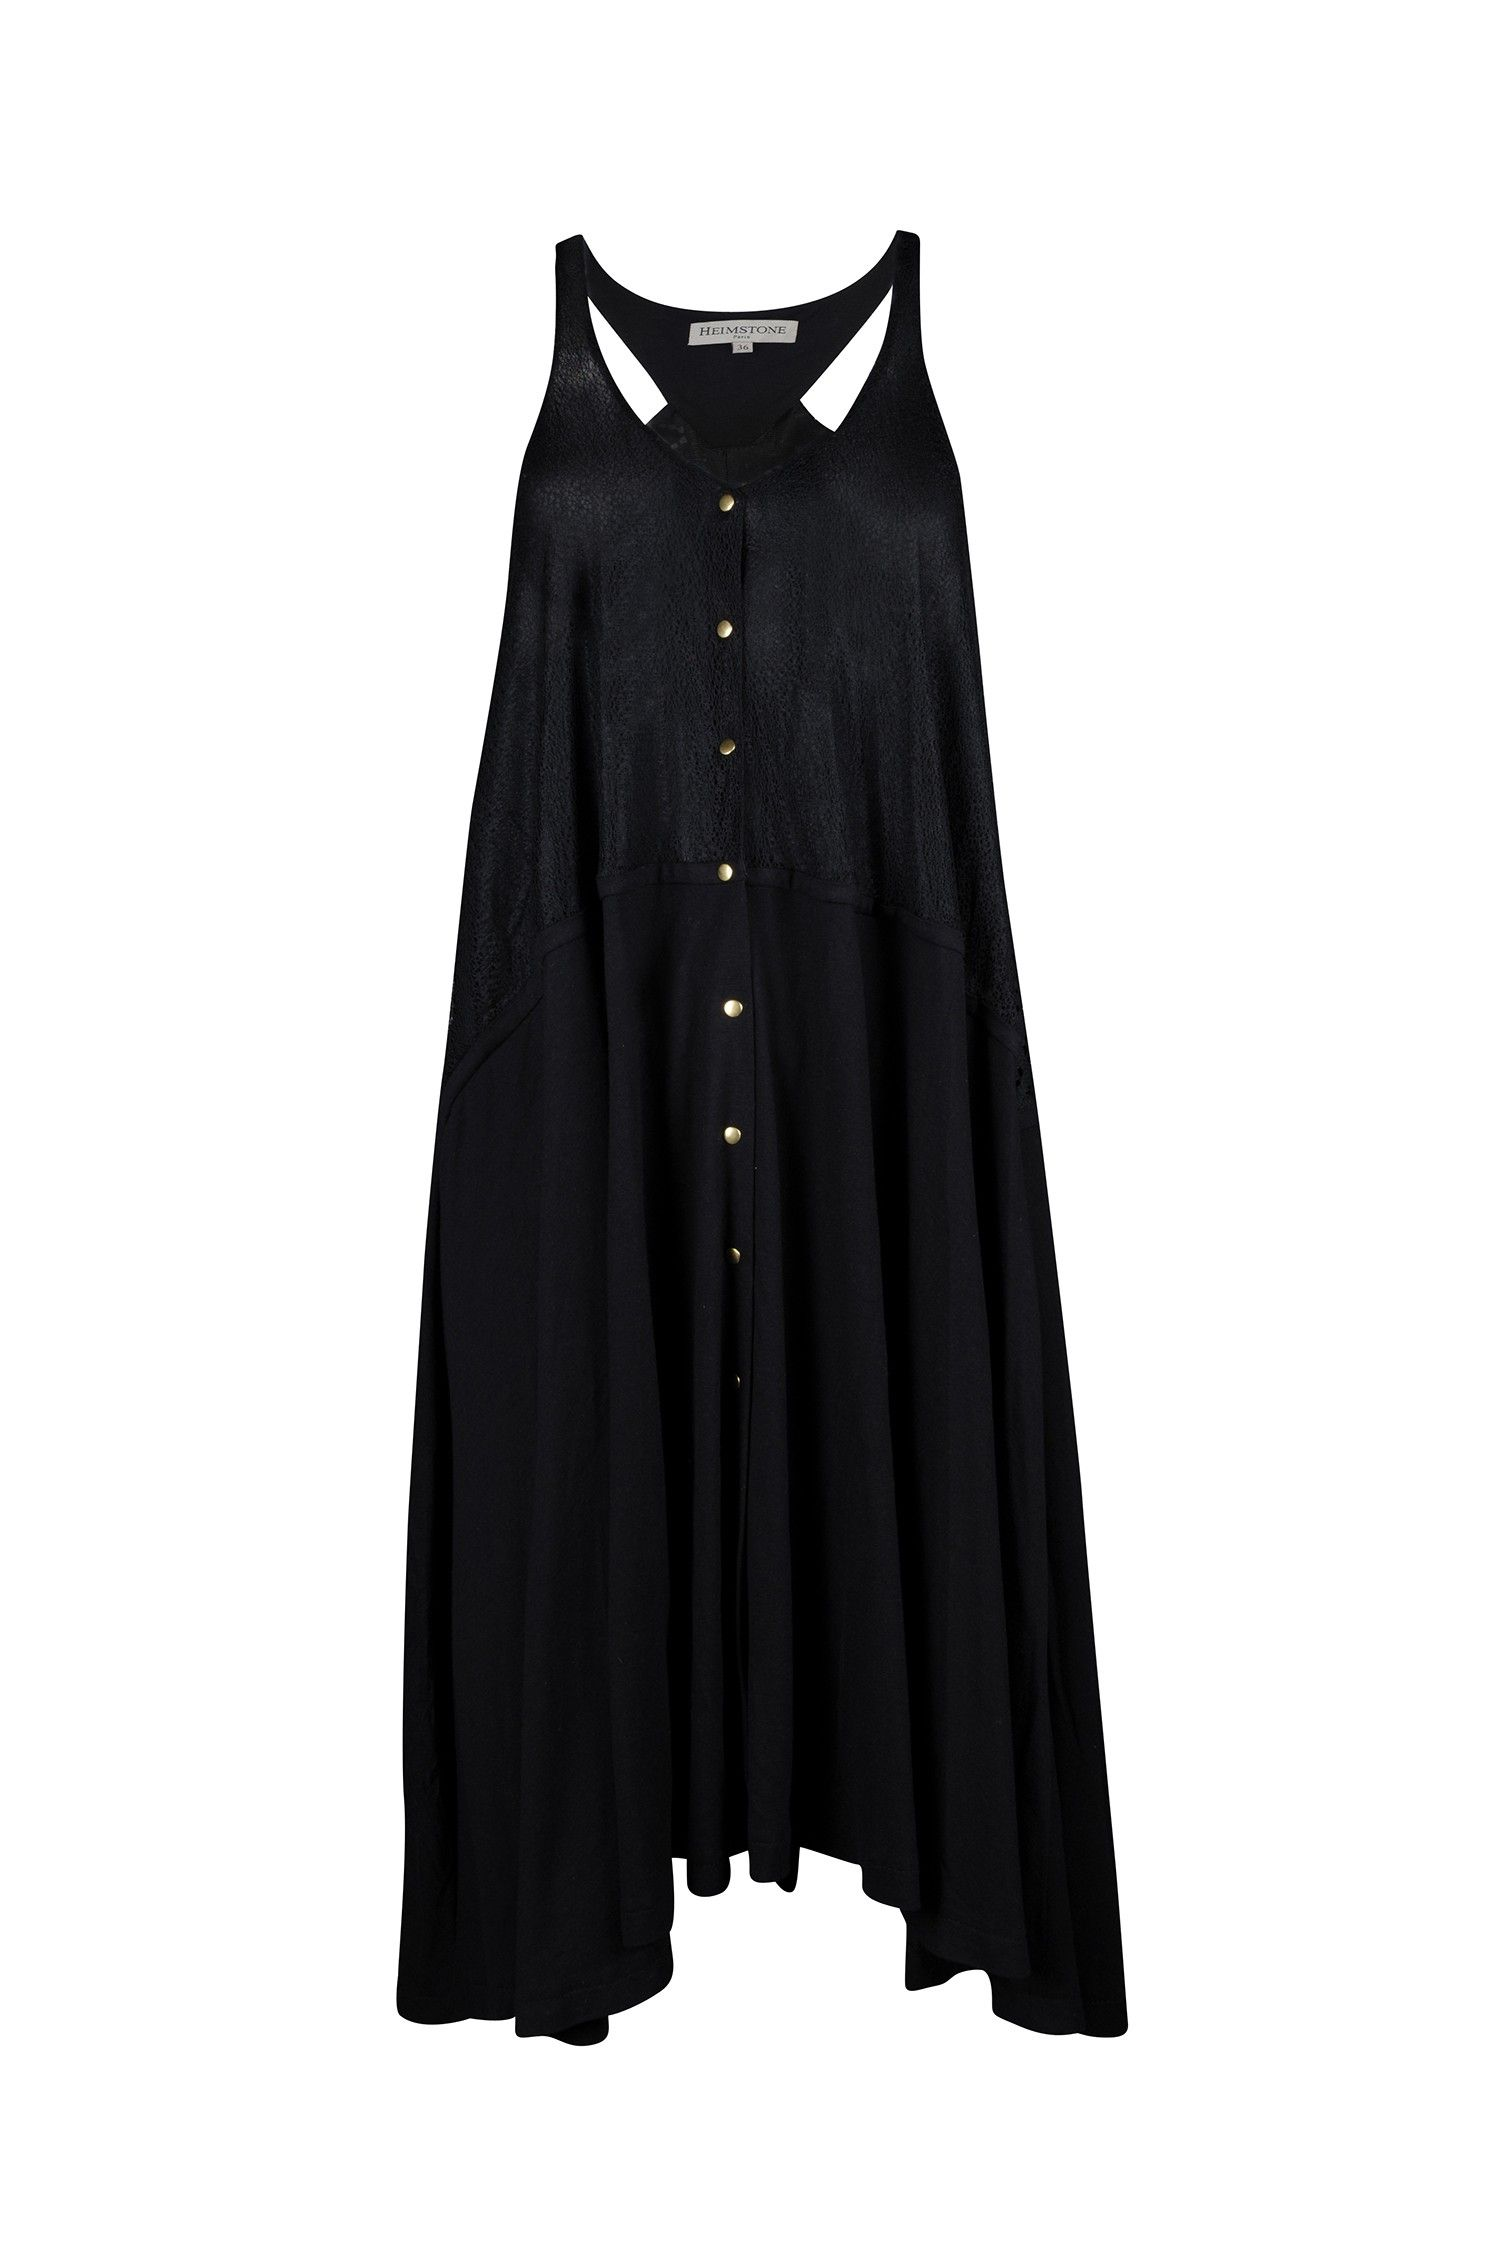 Heimstone / Java dress black